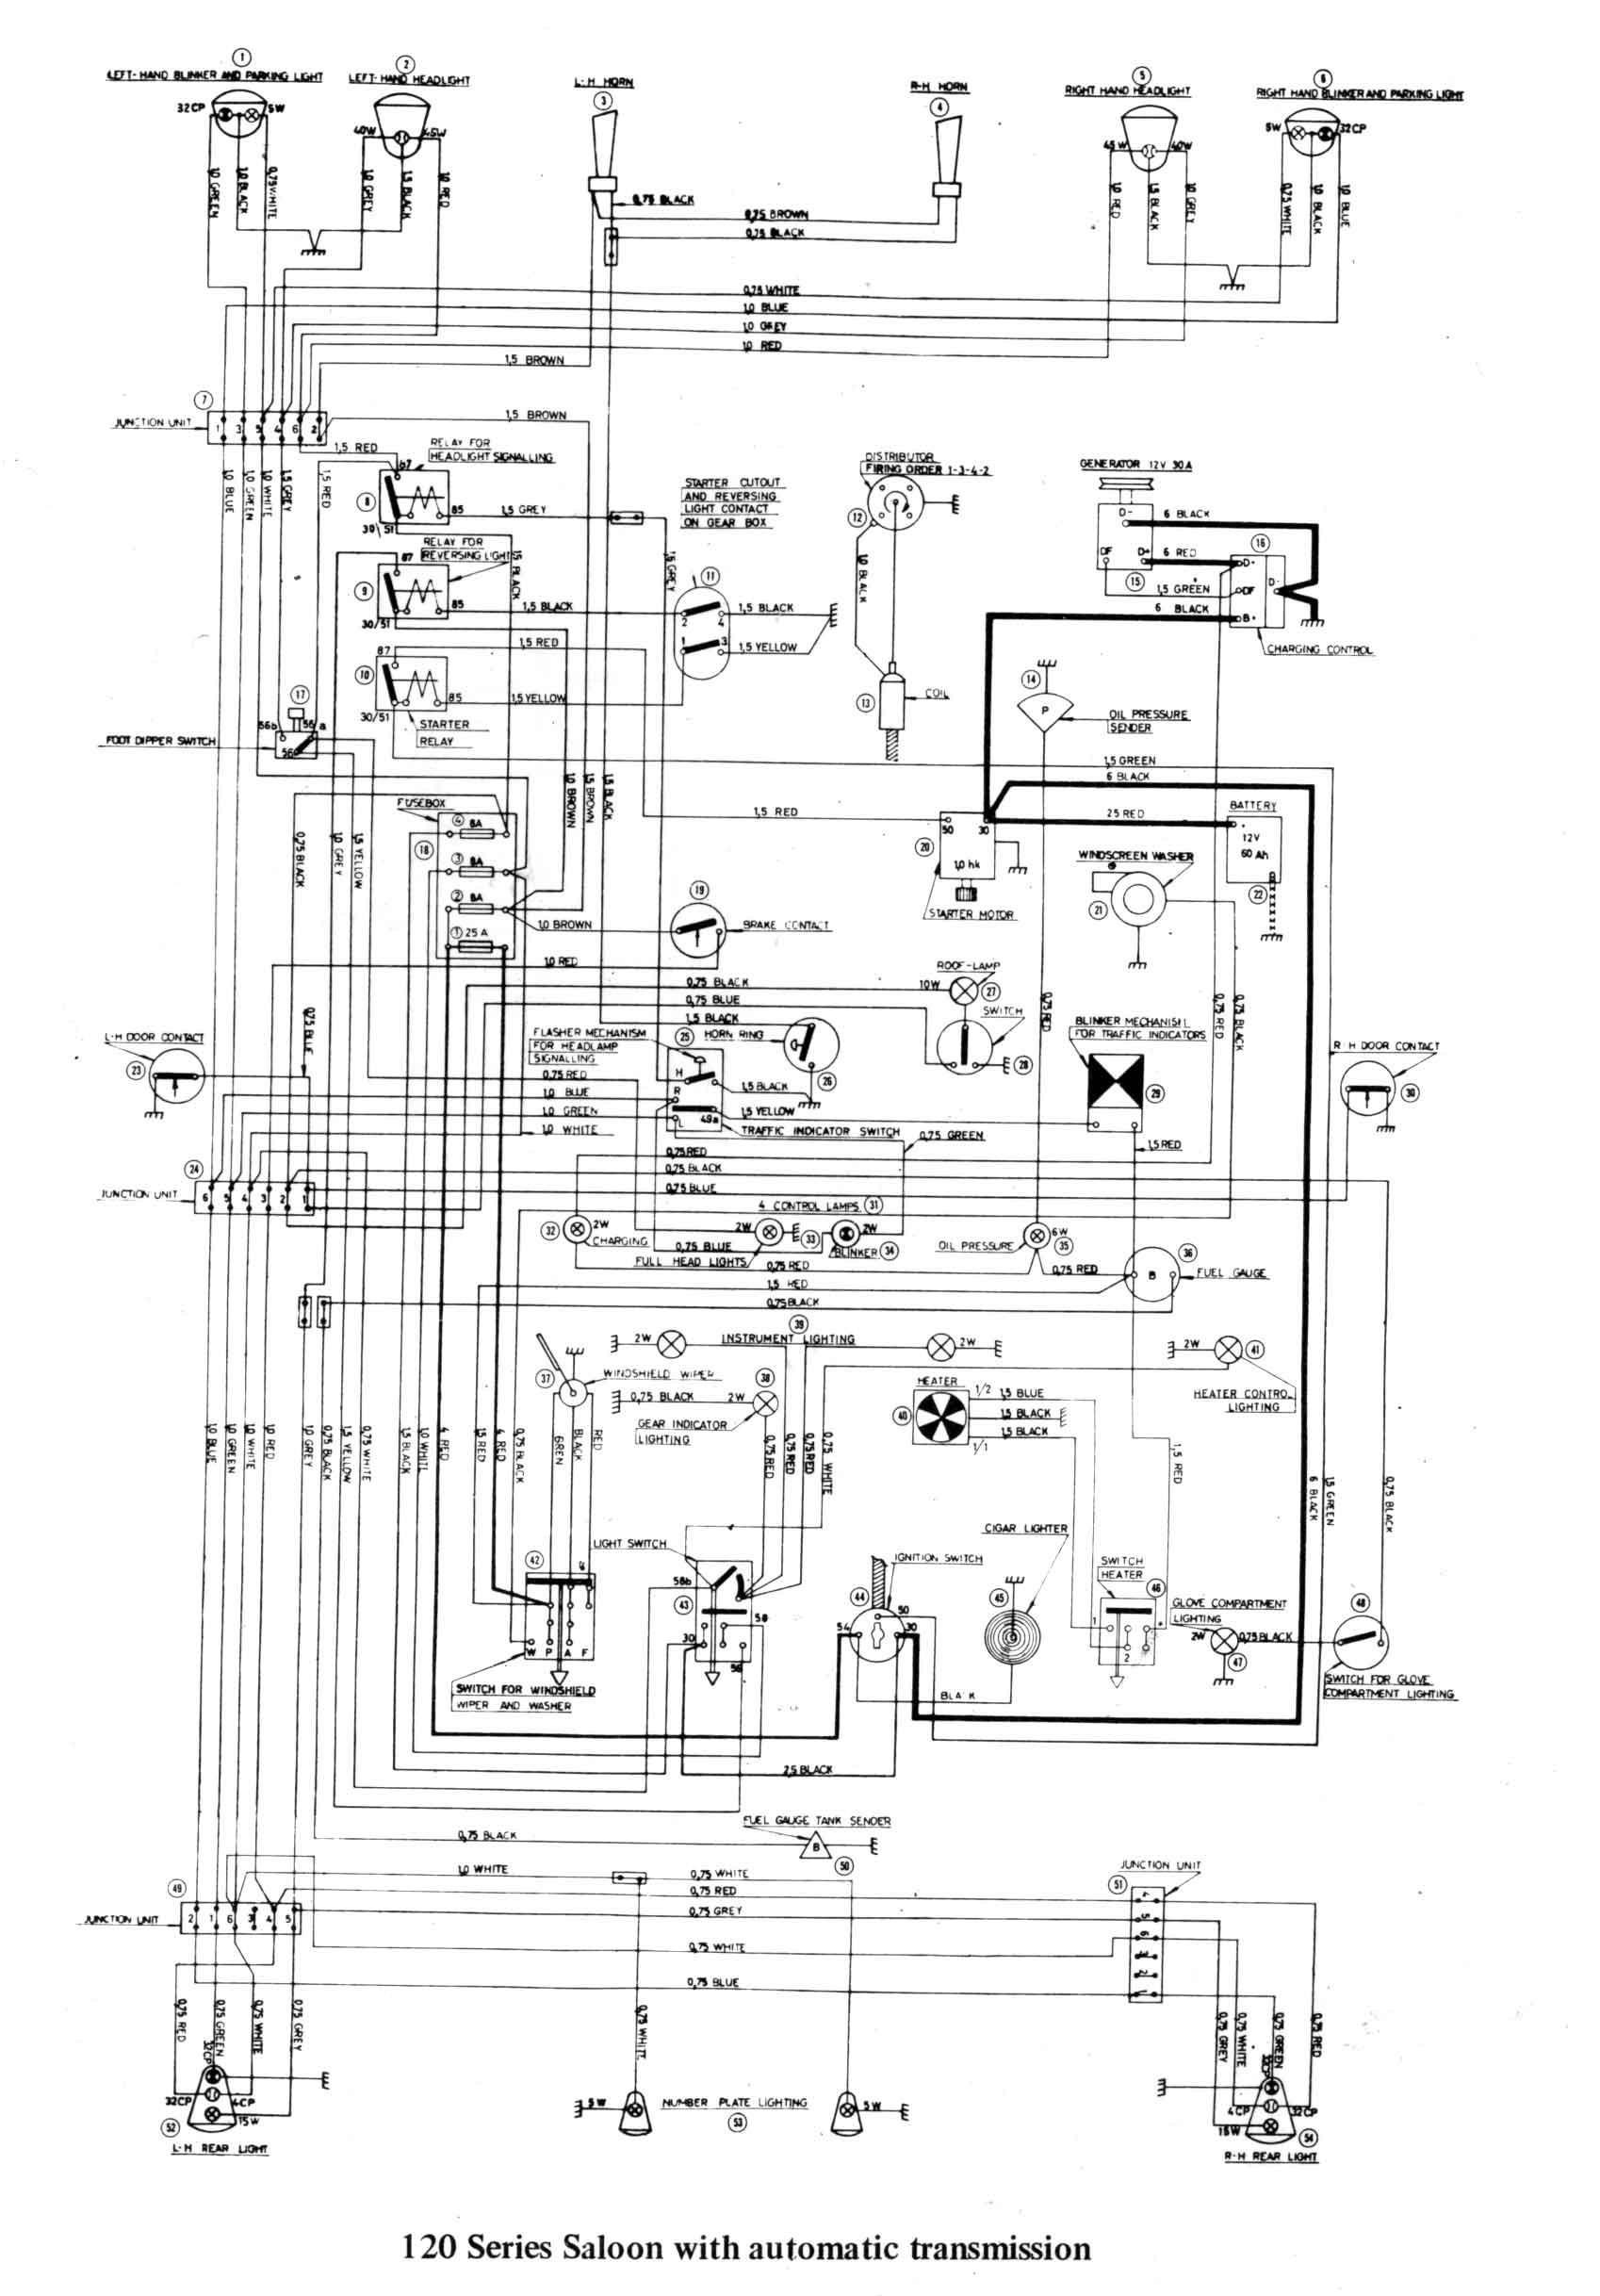 Ford 4 6 Engine Diagram 2 Genie S40 Wiring Diagram Schema Wiring Diagram Of Ford 4 6 Engine Diagram 2